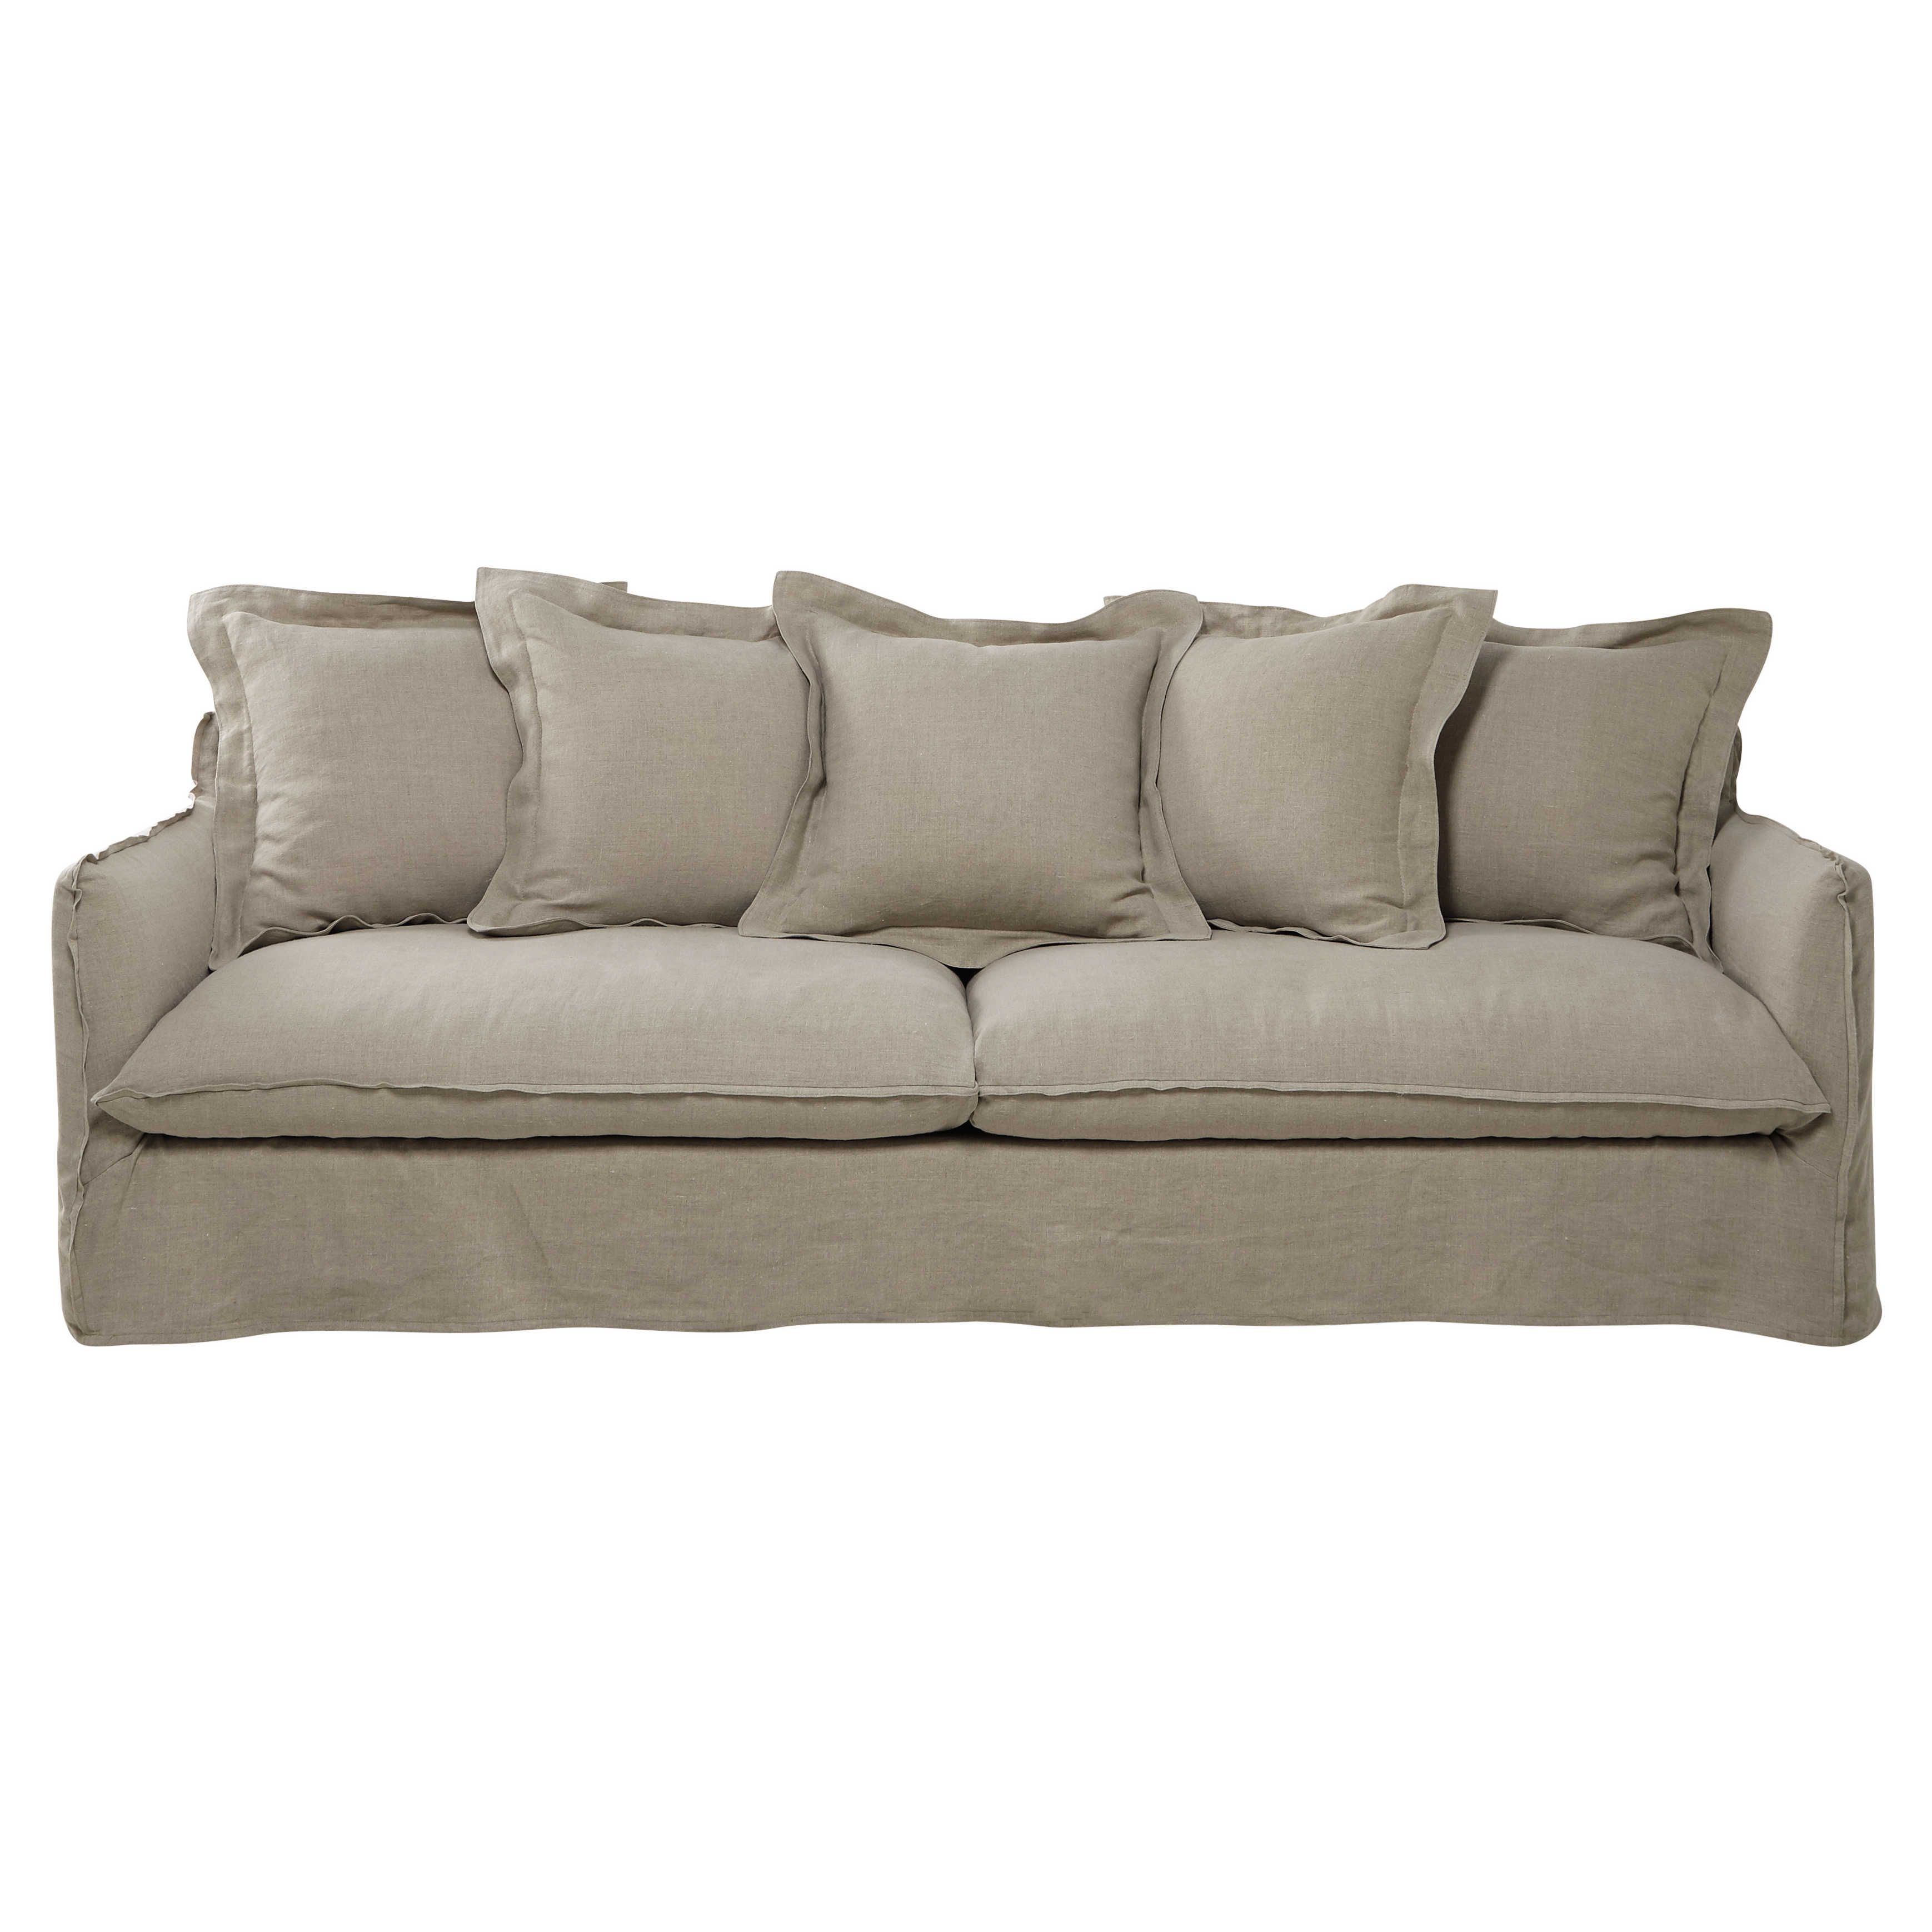 Sofas Derechos Linen Sofa Sofa Beige Sofa